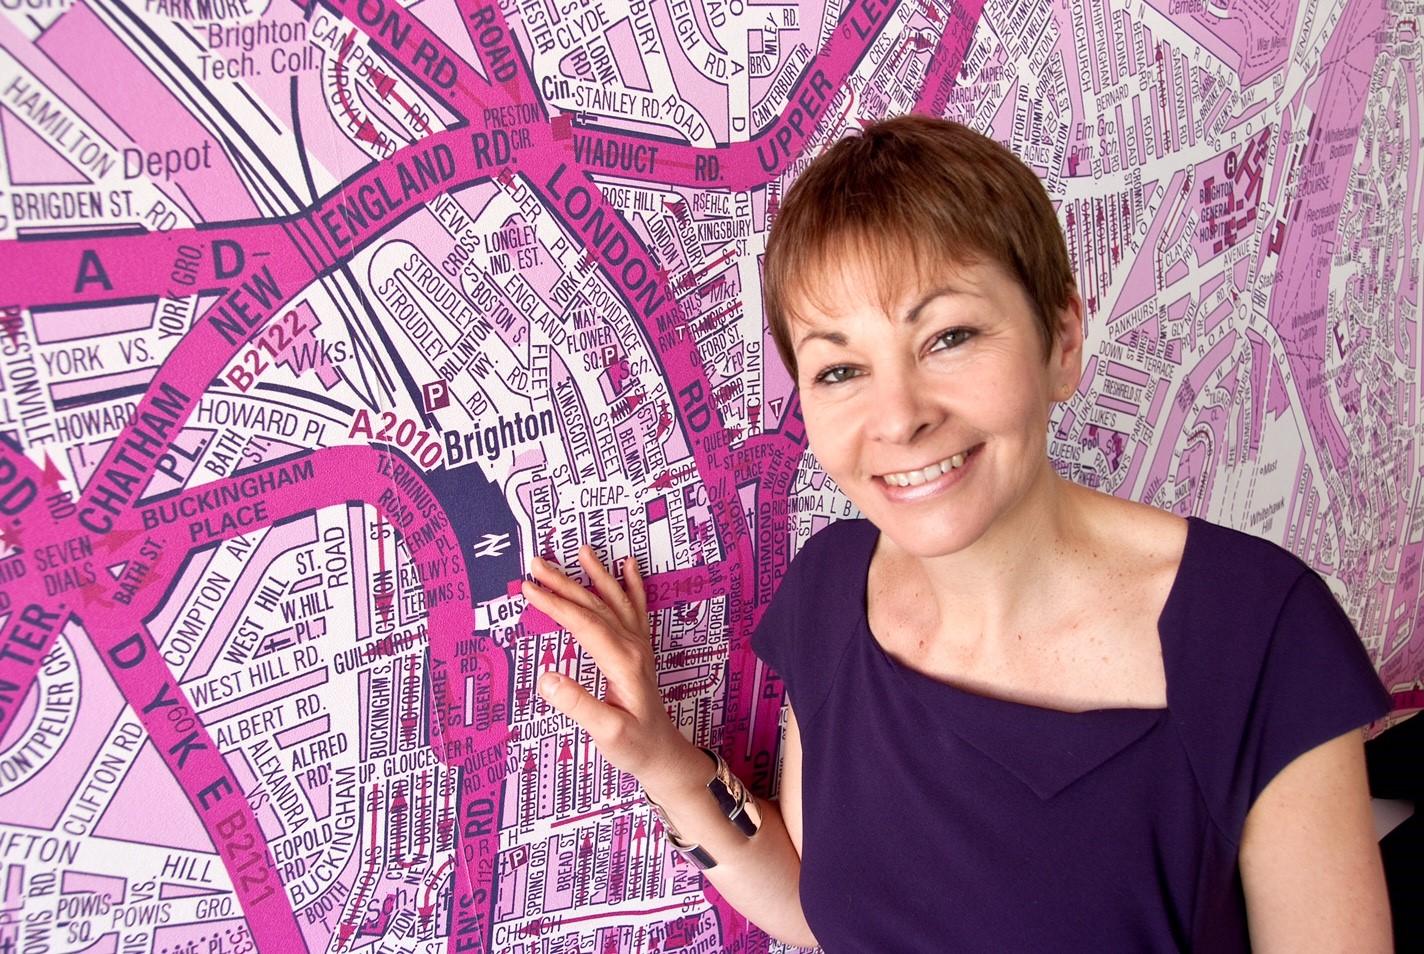 Caroline - Brighton Pavilion map